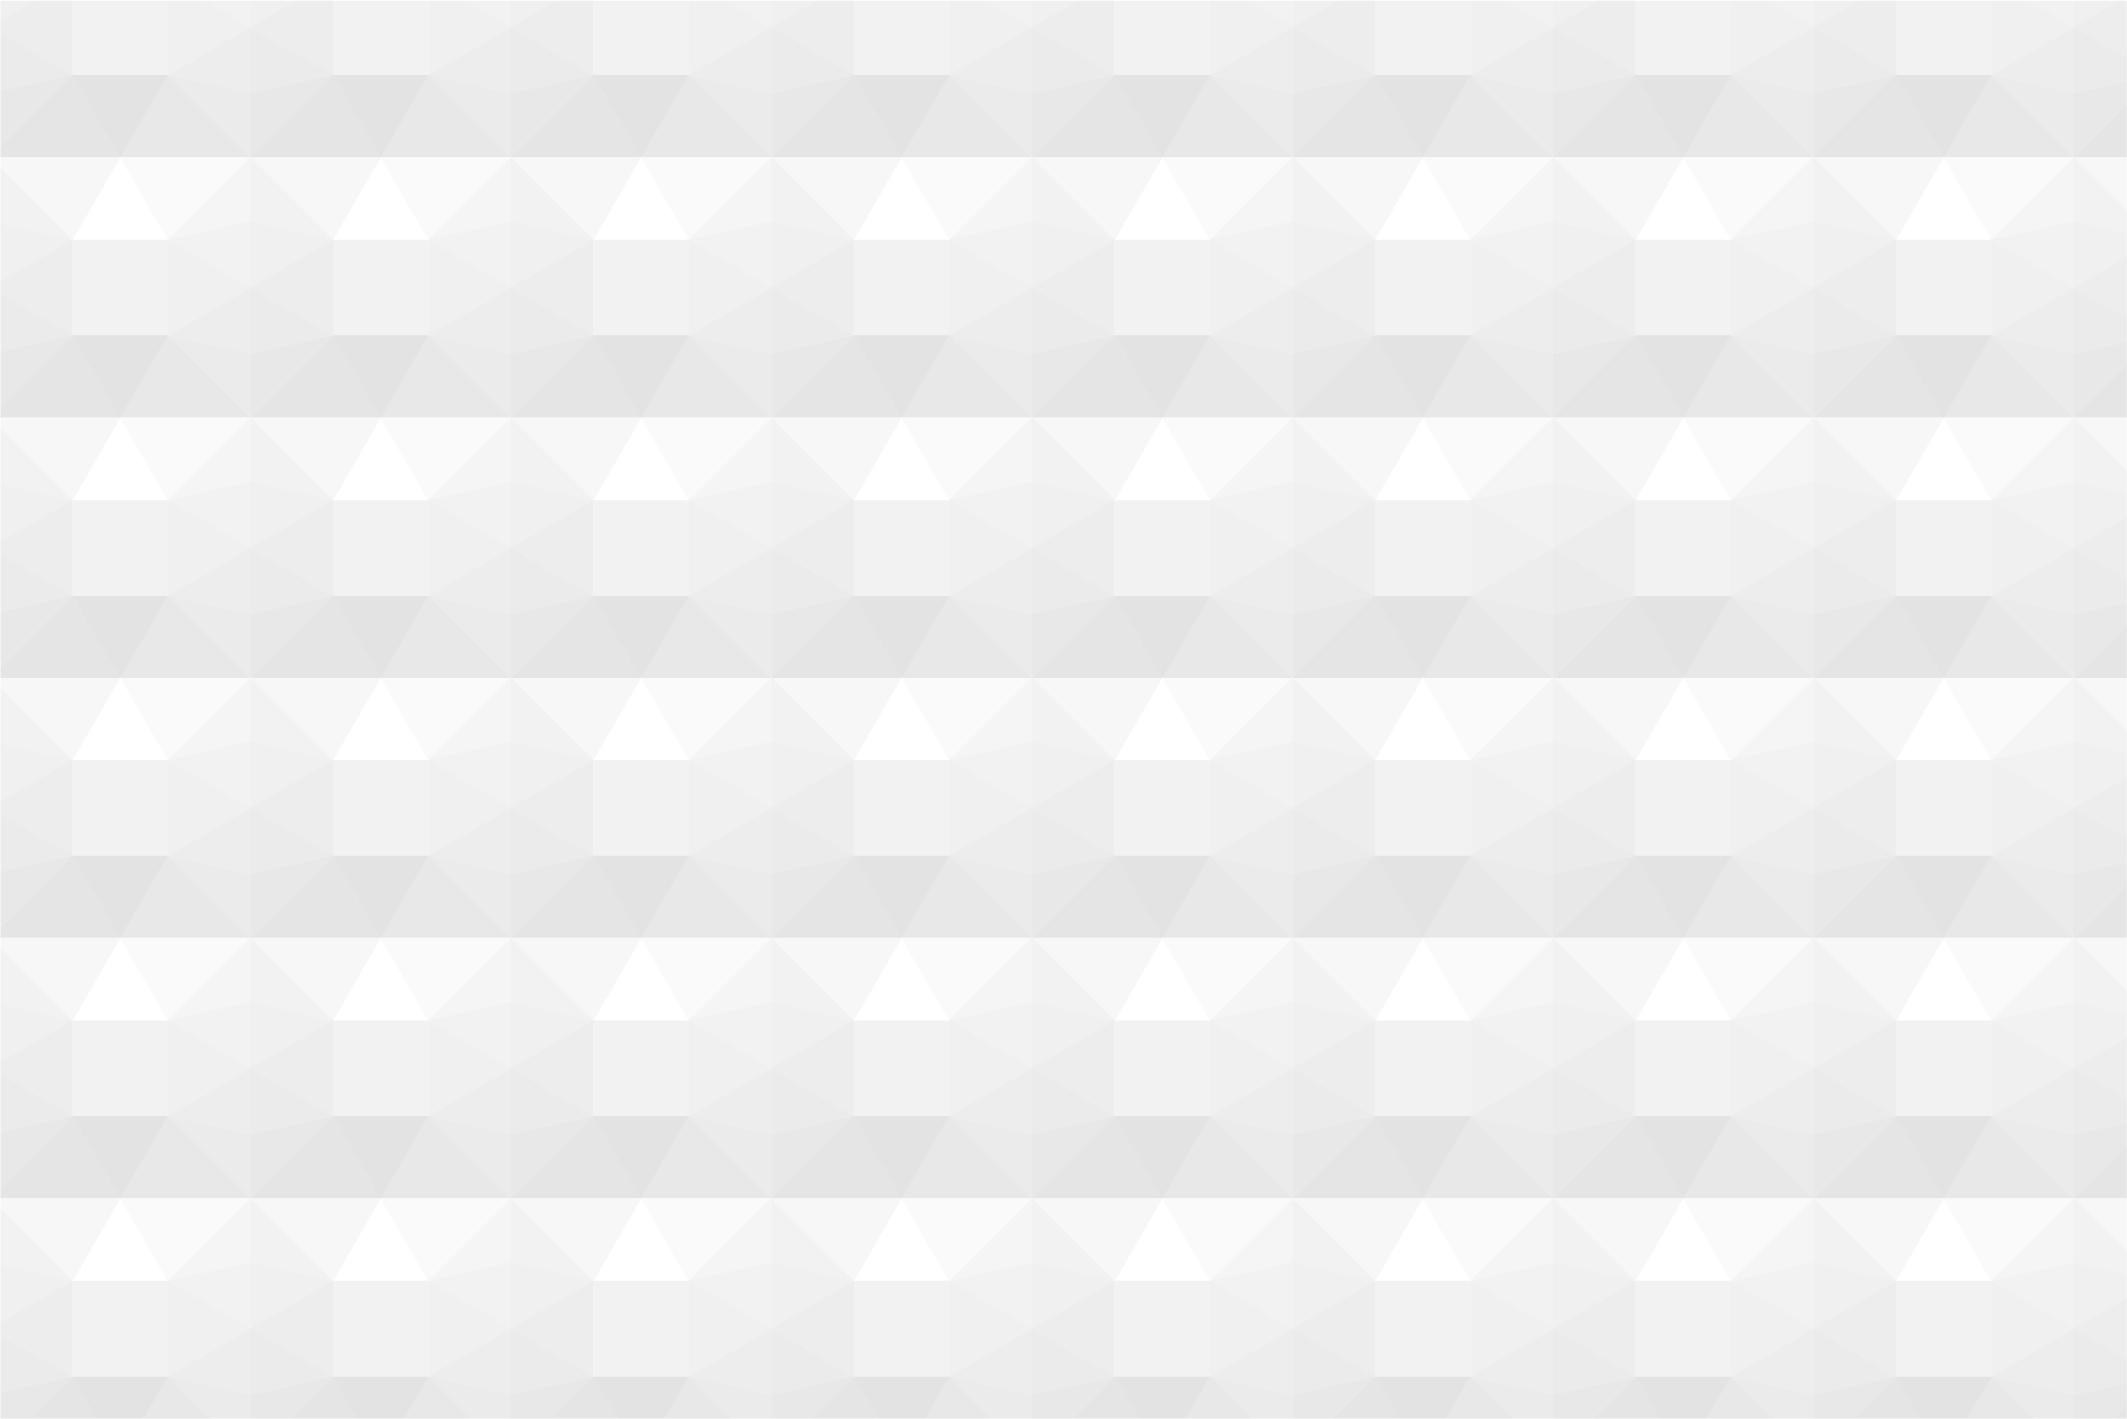 Geometric white 3d seamless textures example image 3